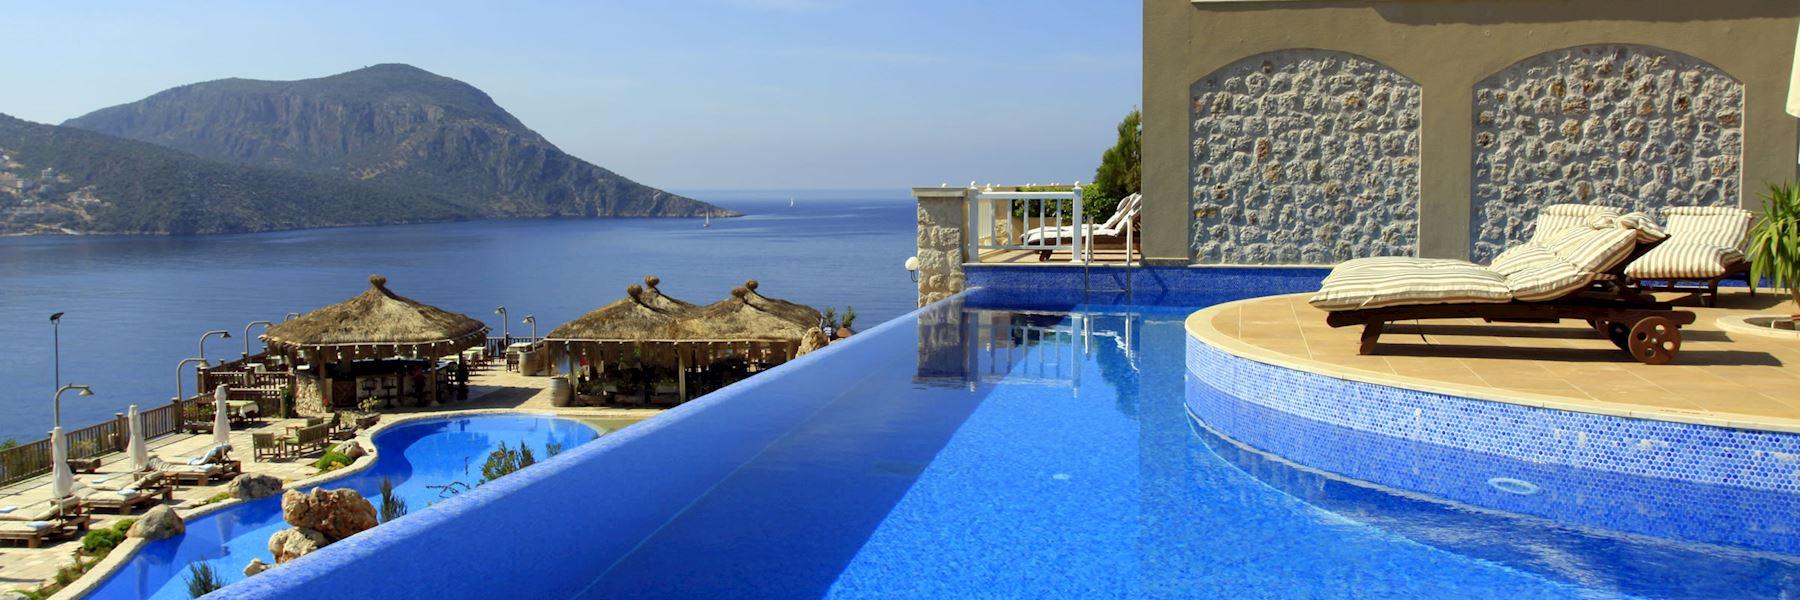 Accommodation in Turkey